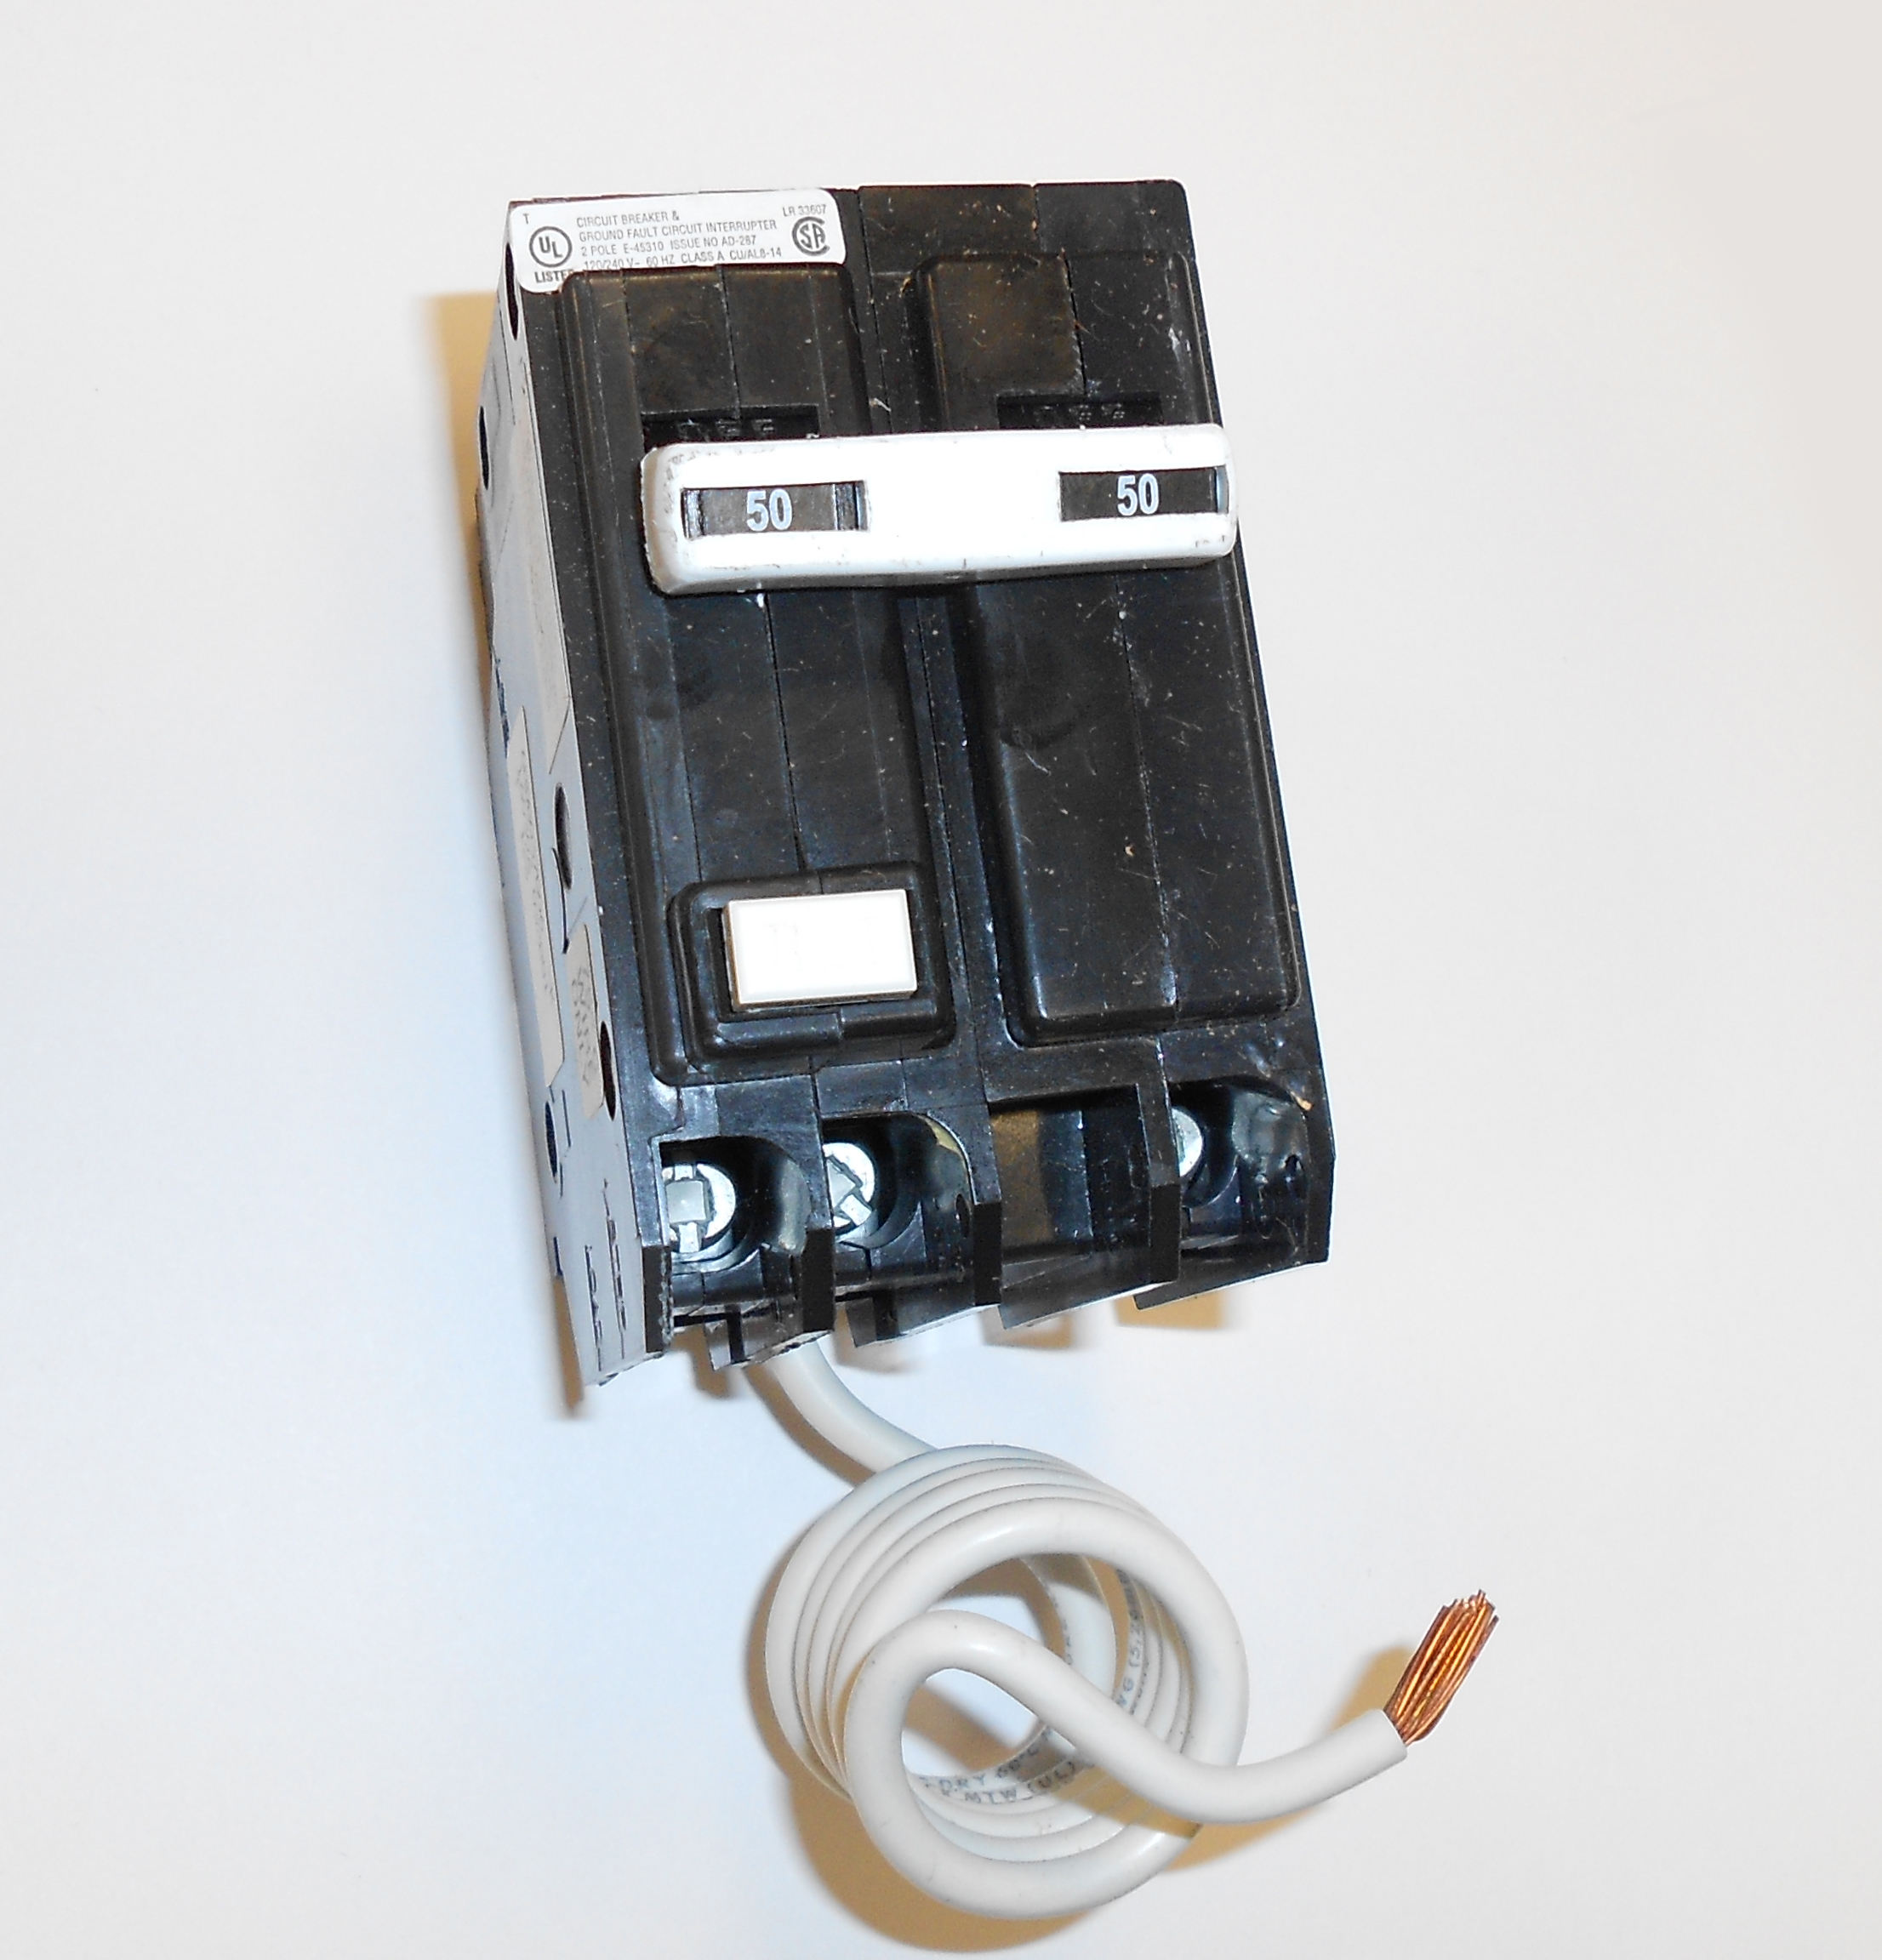 Wiring Diagram 15 Amp Circuit Breaker 120 Volt Circuit Electrical